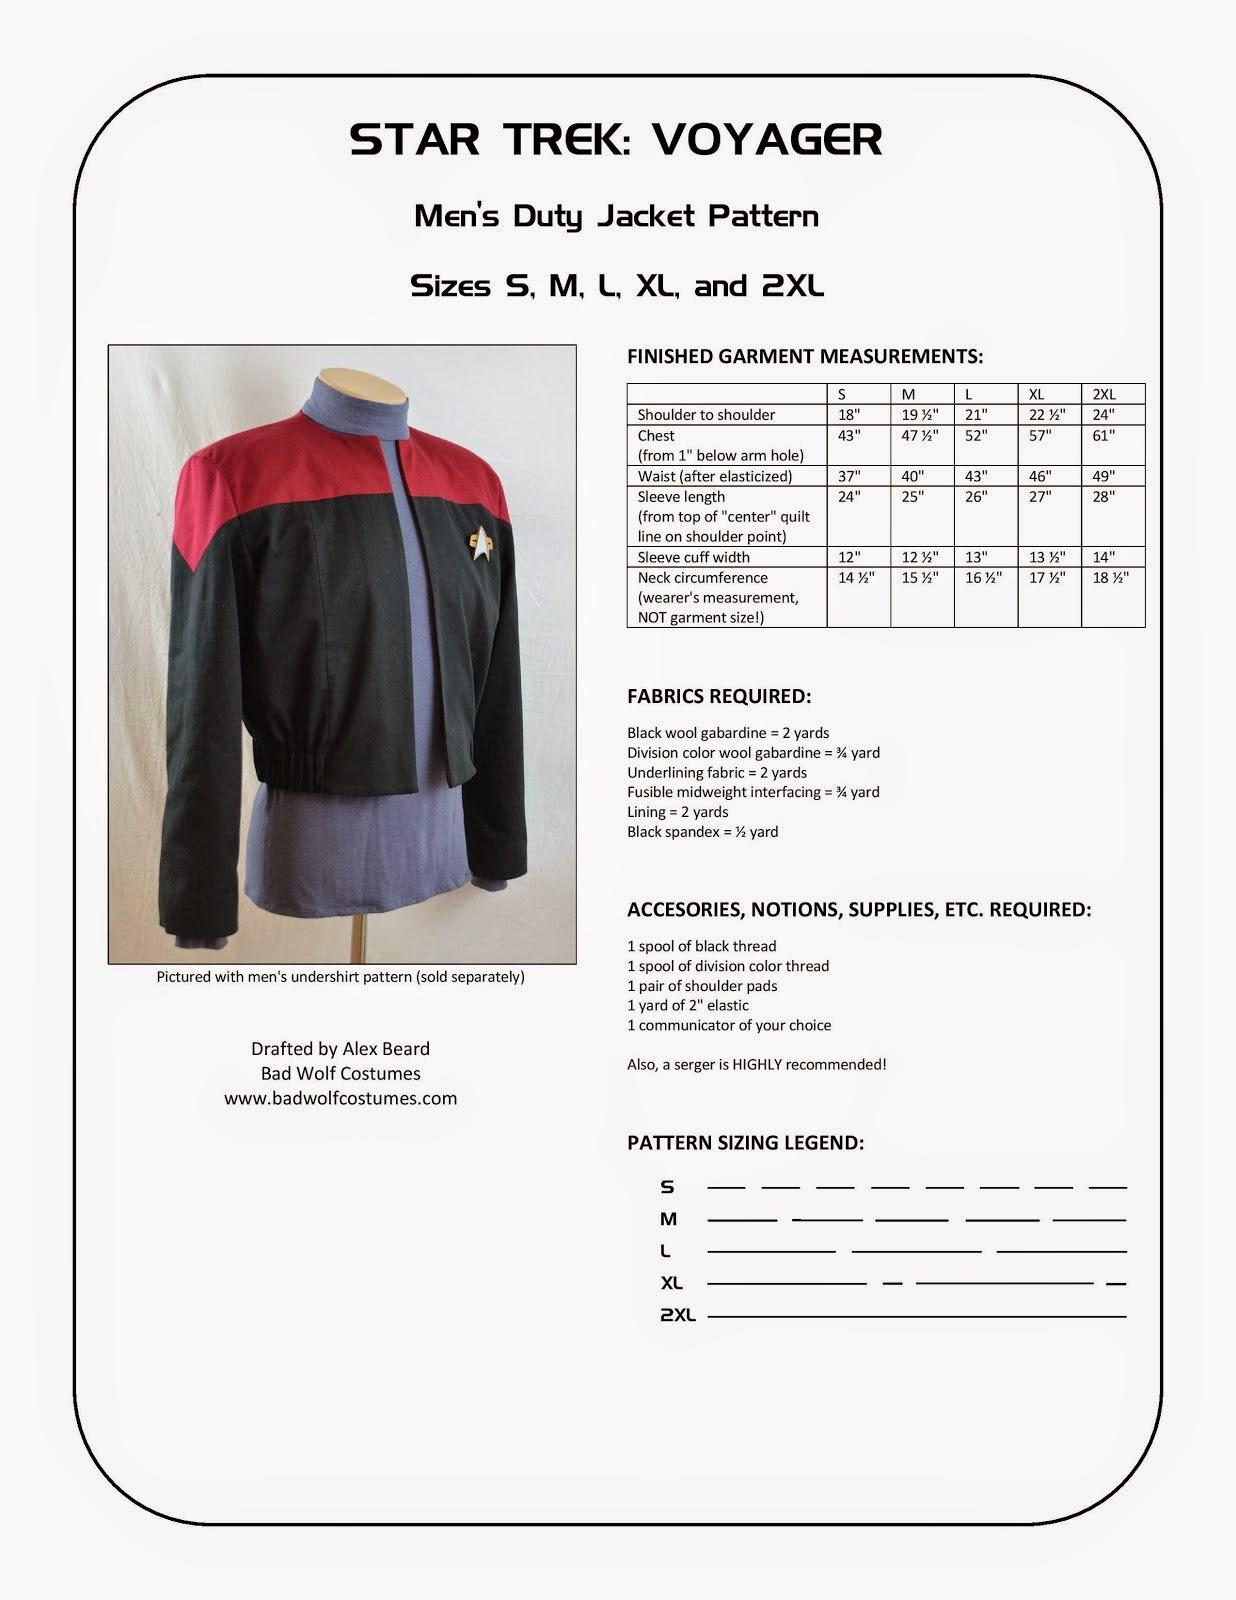 Star Trek: Voyager Men's Duty Jacket Sewing Pattern